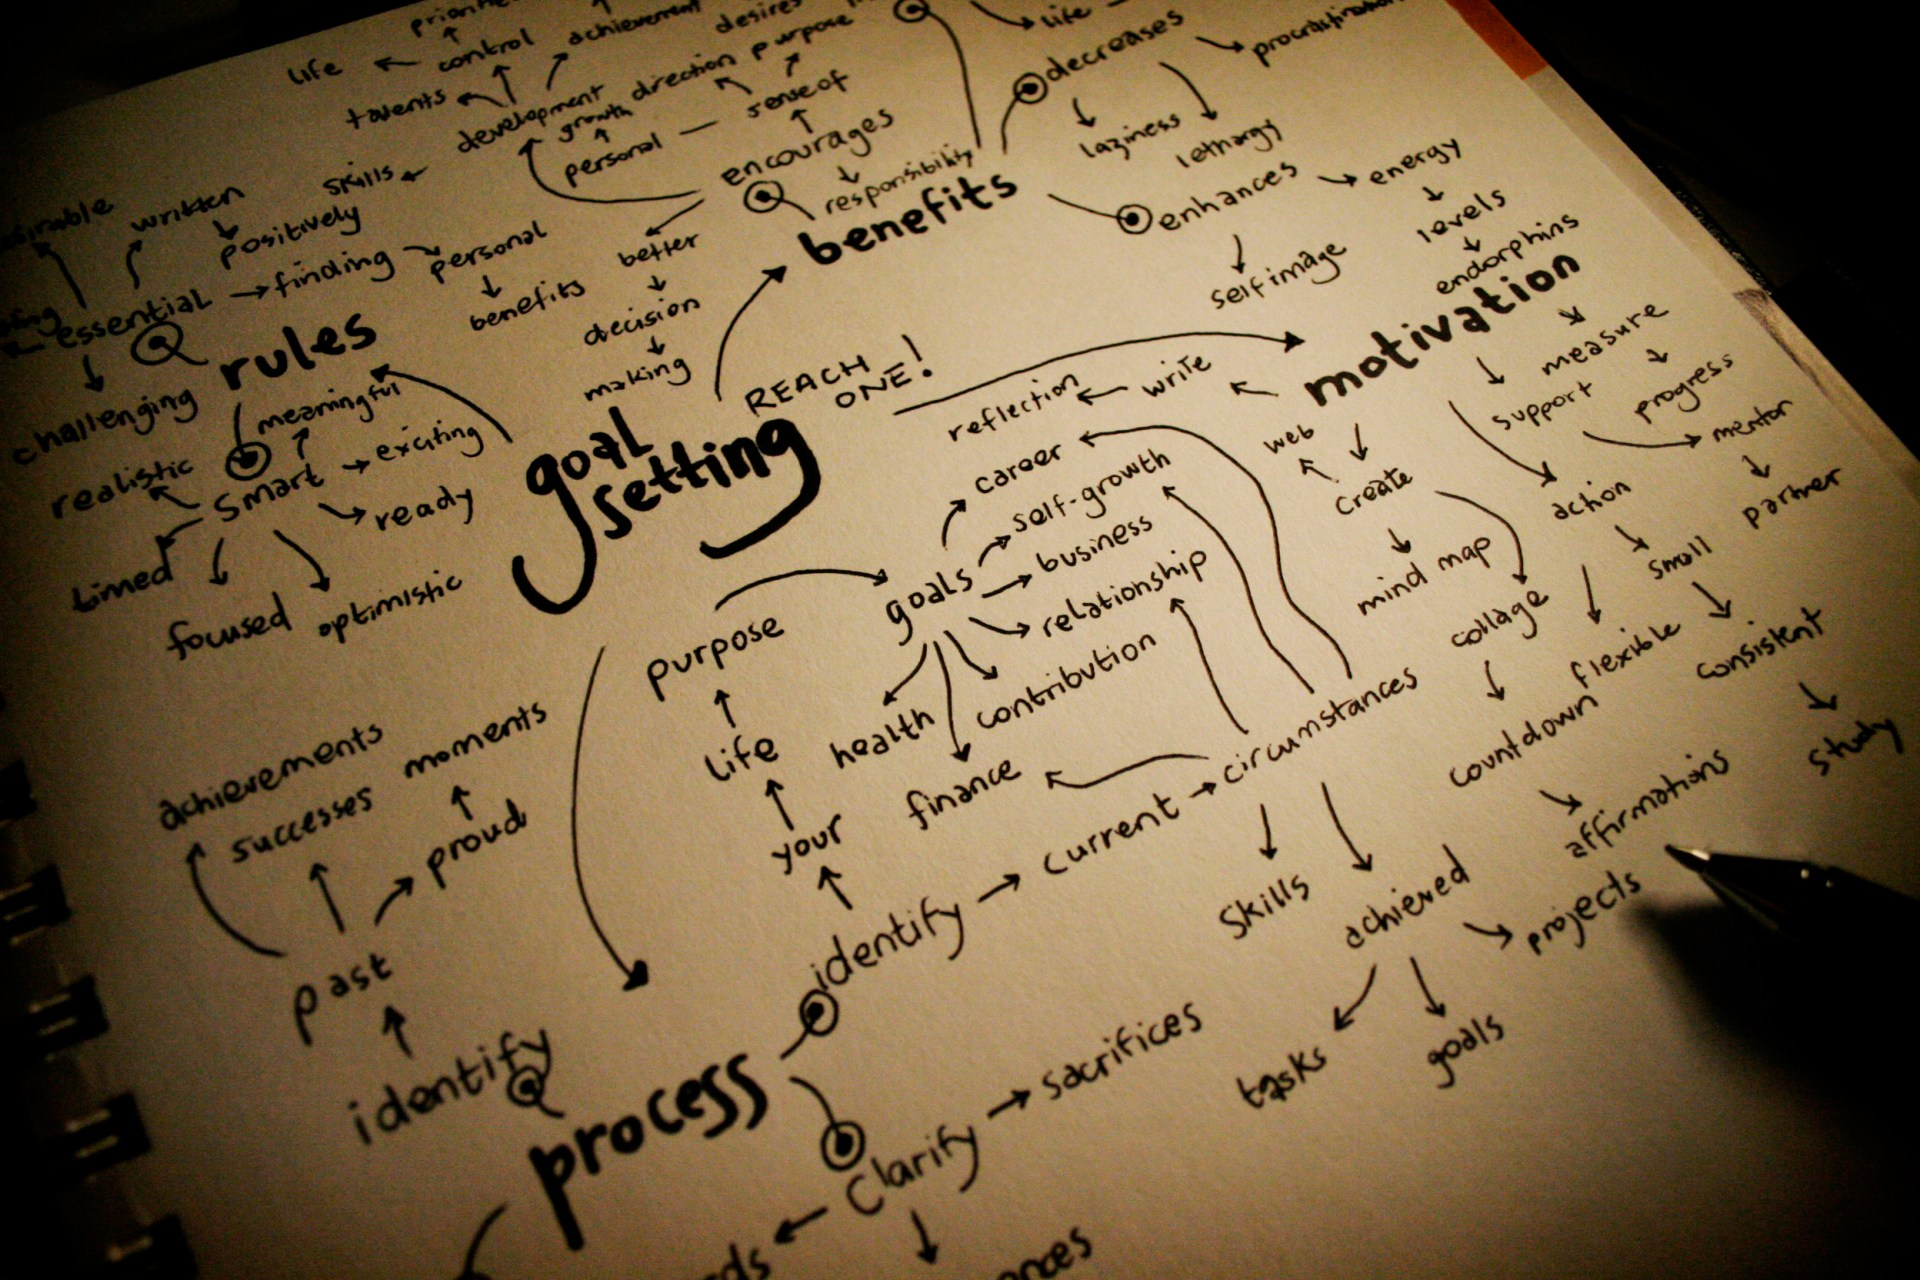 <span class='p-name'>Goals, Strategies, Objectives, & Tactics</span>